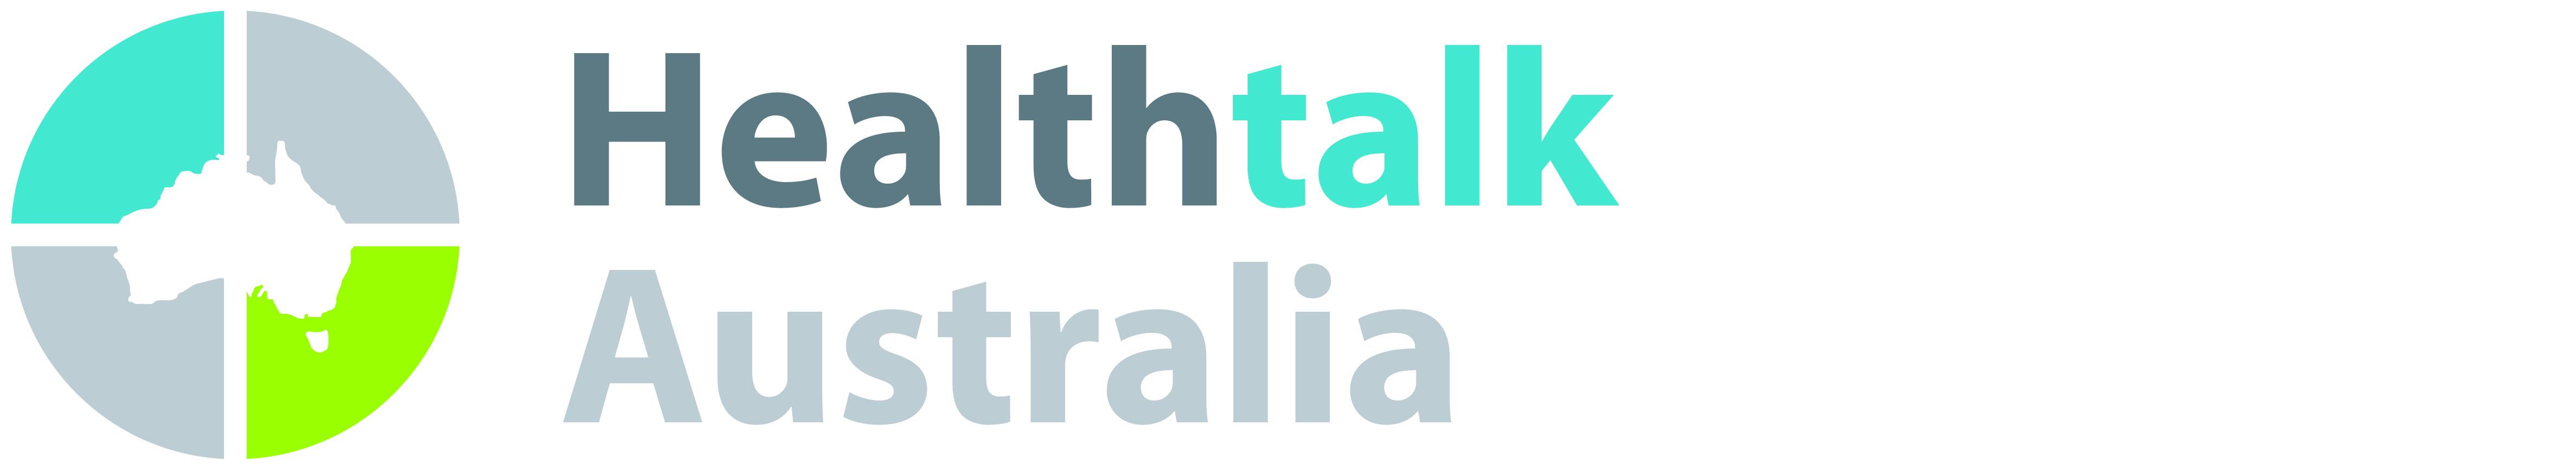 Healthtalk Australia logo